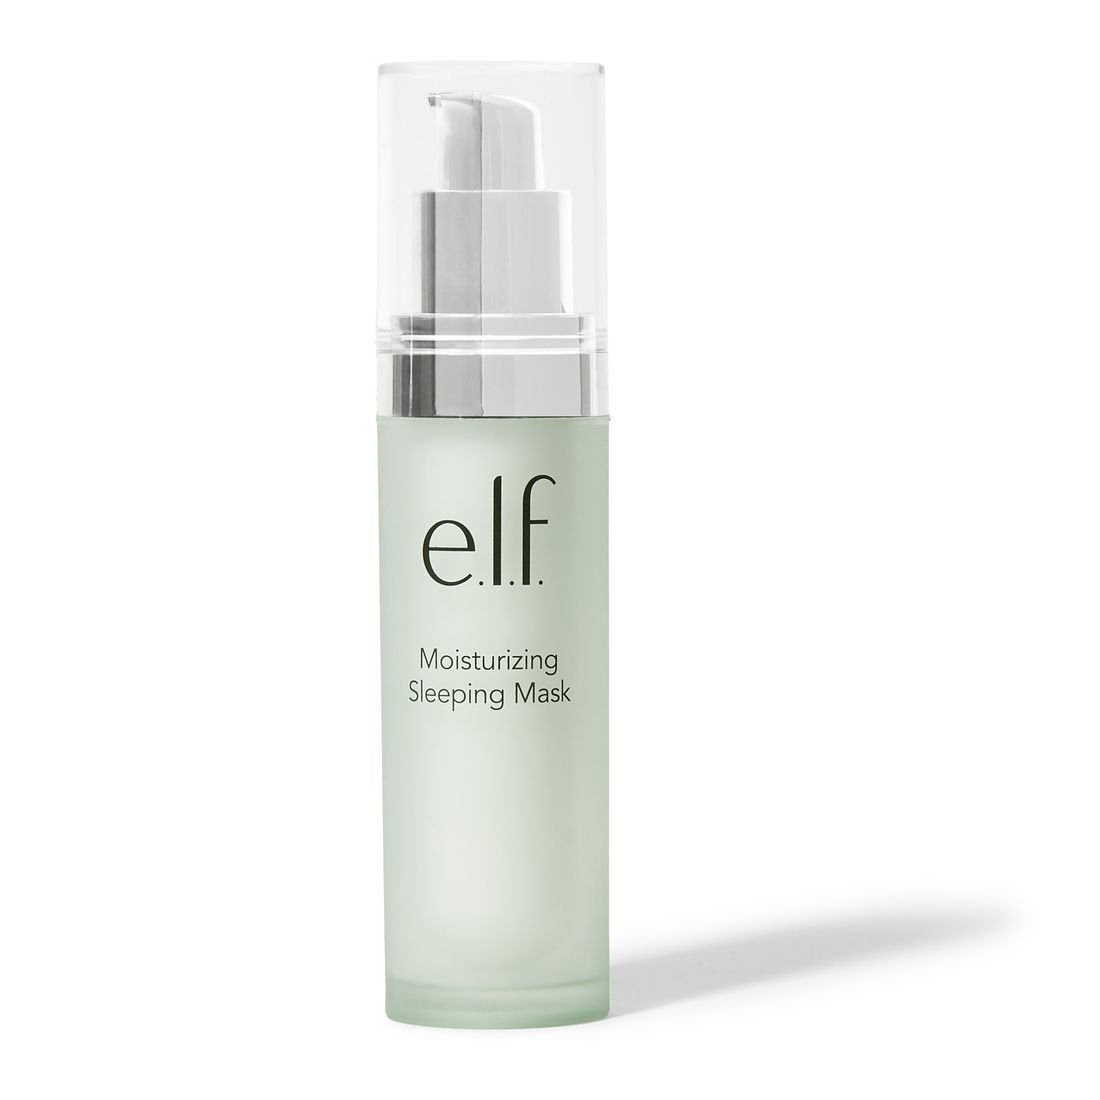 ELF COSMETICS. E.L.F. moisturising sleeping masks